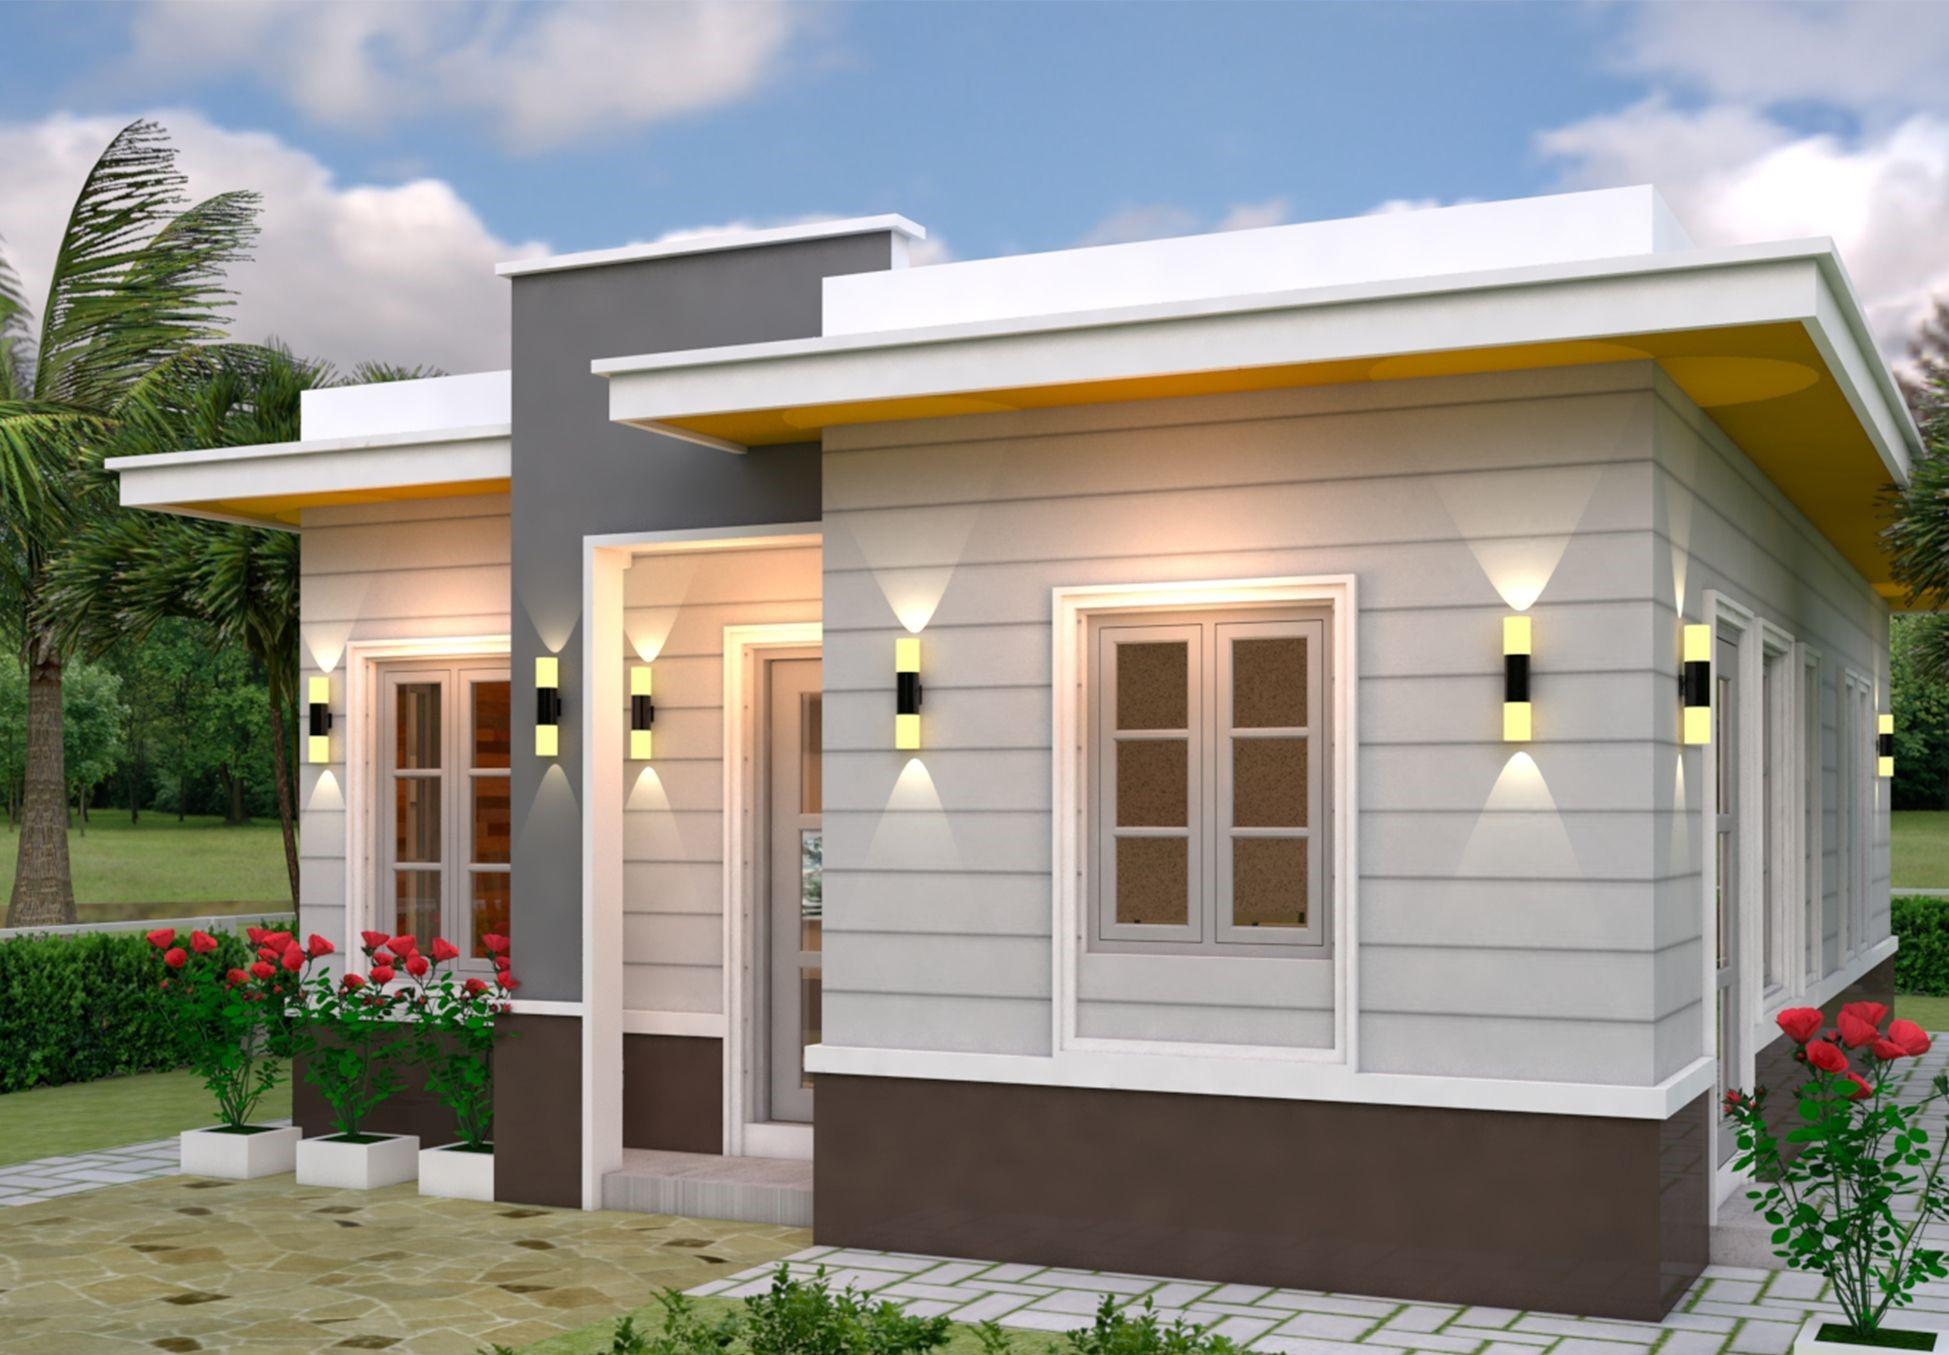 Planos para casas de 7 metros de frente